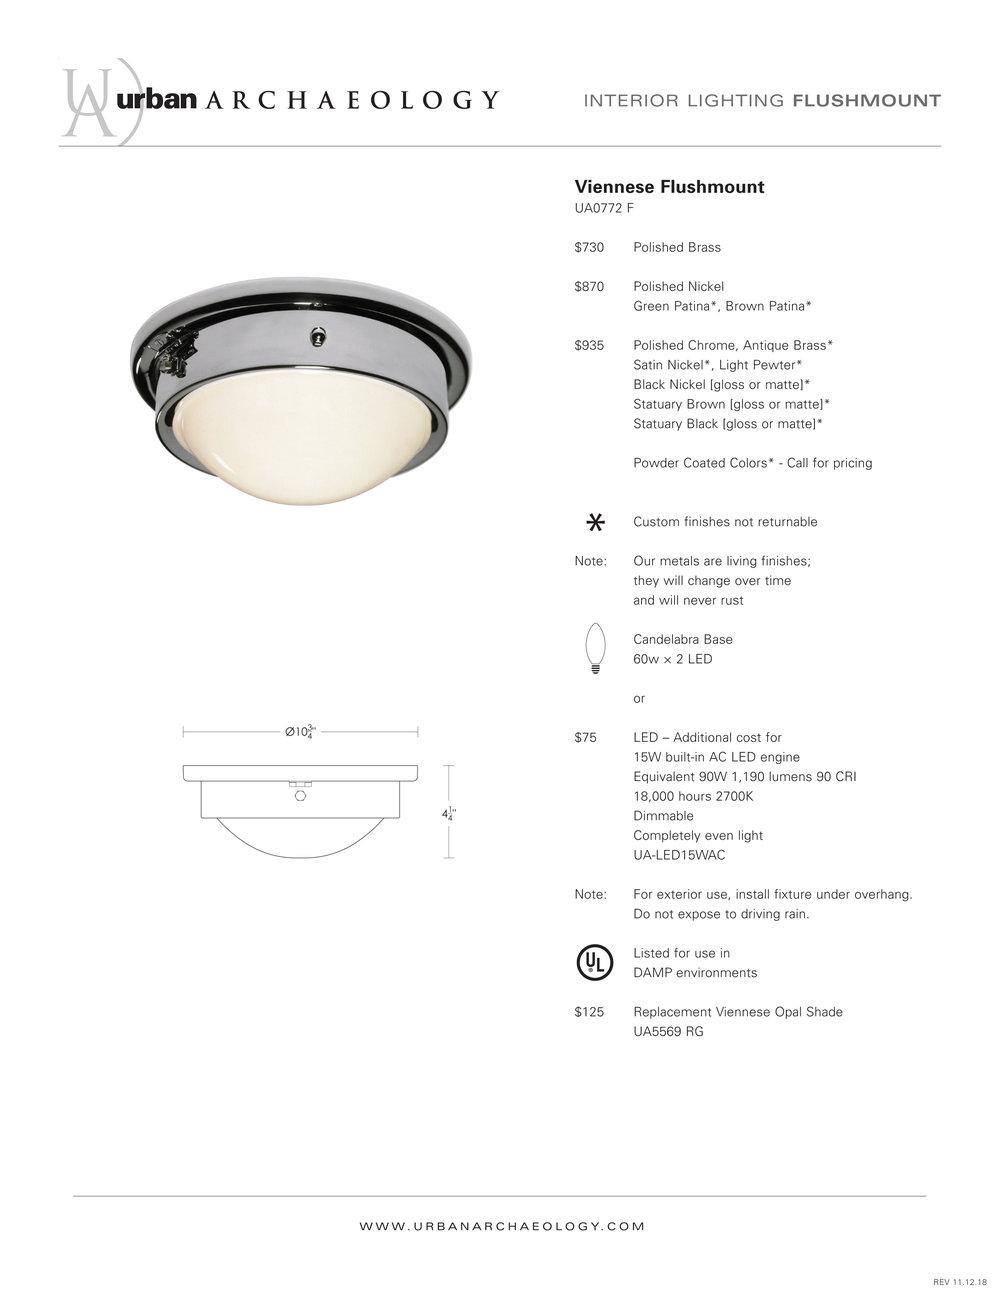 UA Viennese flushmount spec sheet.jpg